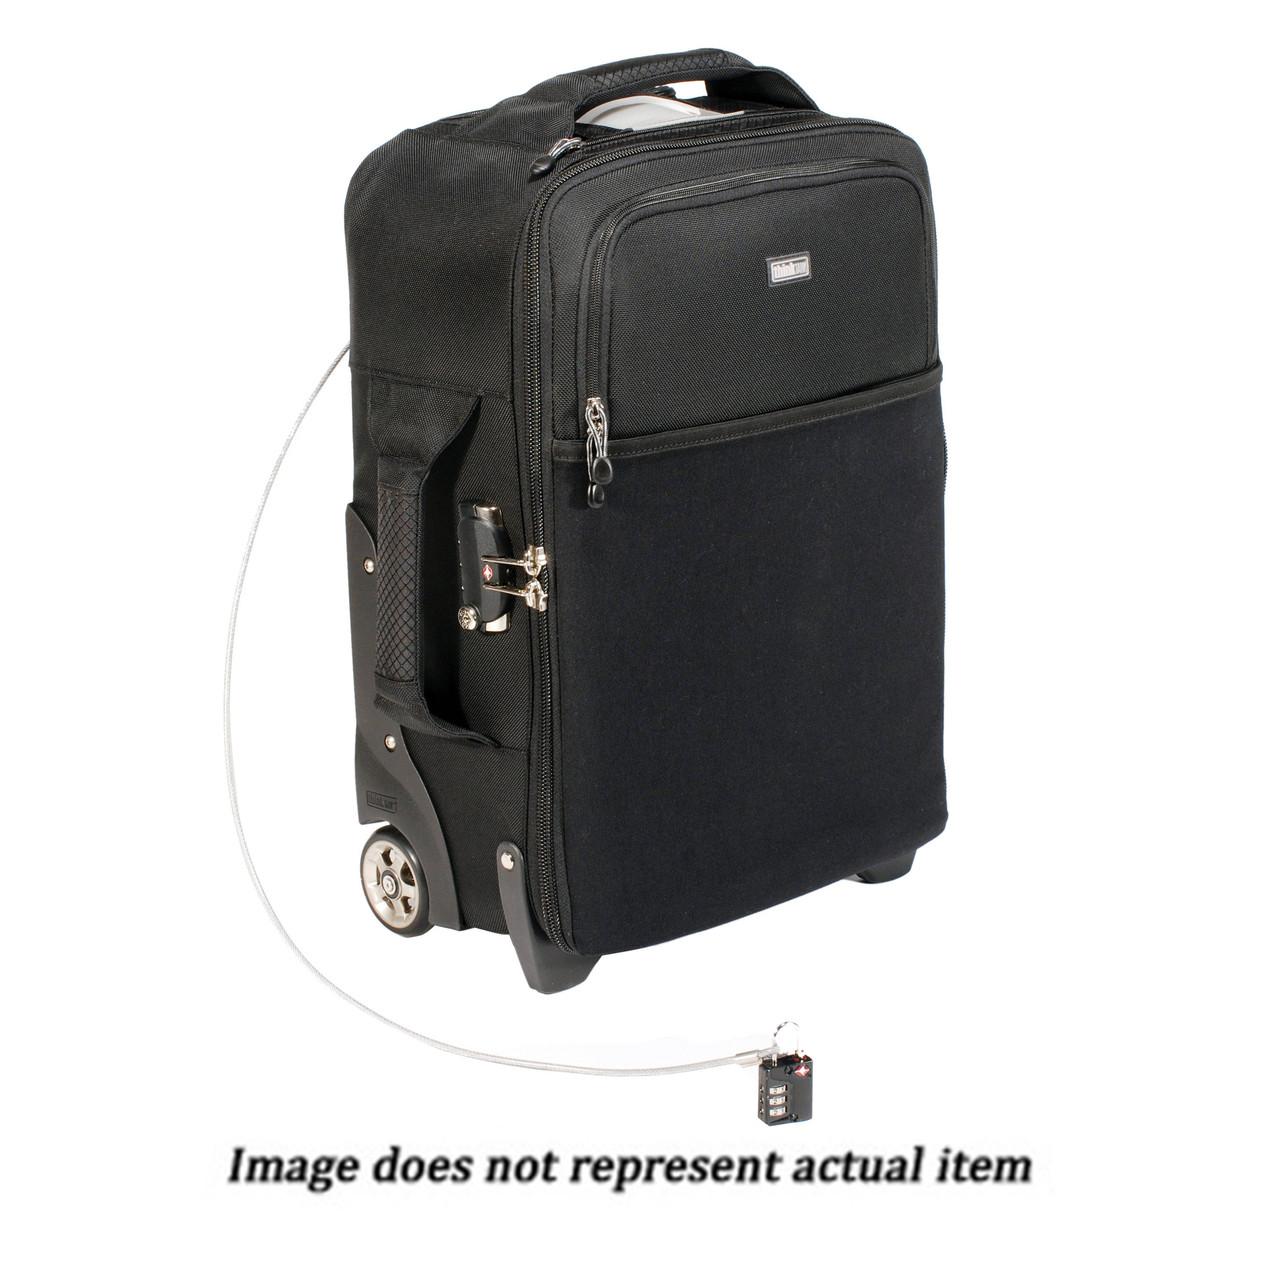 Think Tank Airport International V 2.0 Rolling Camera Bag - (USED)